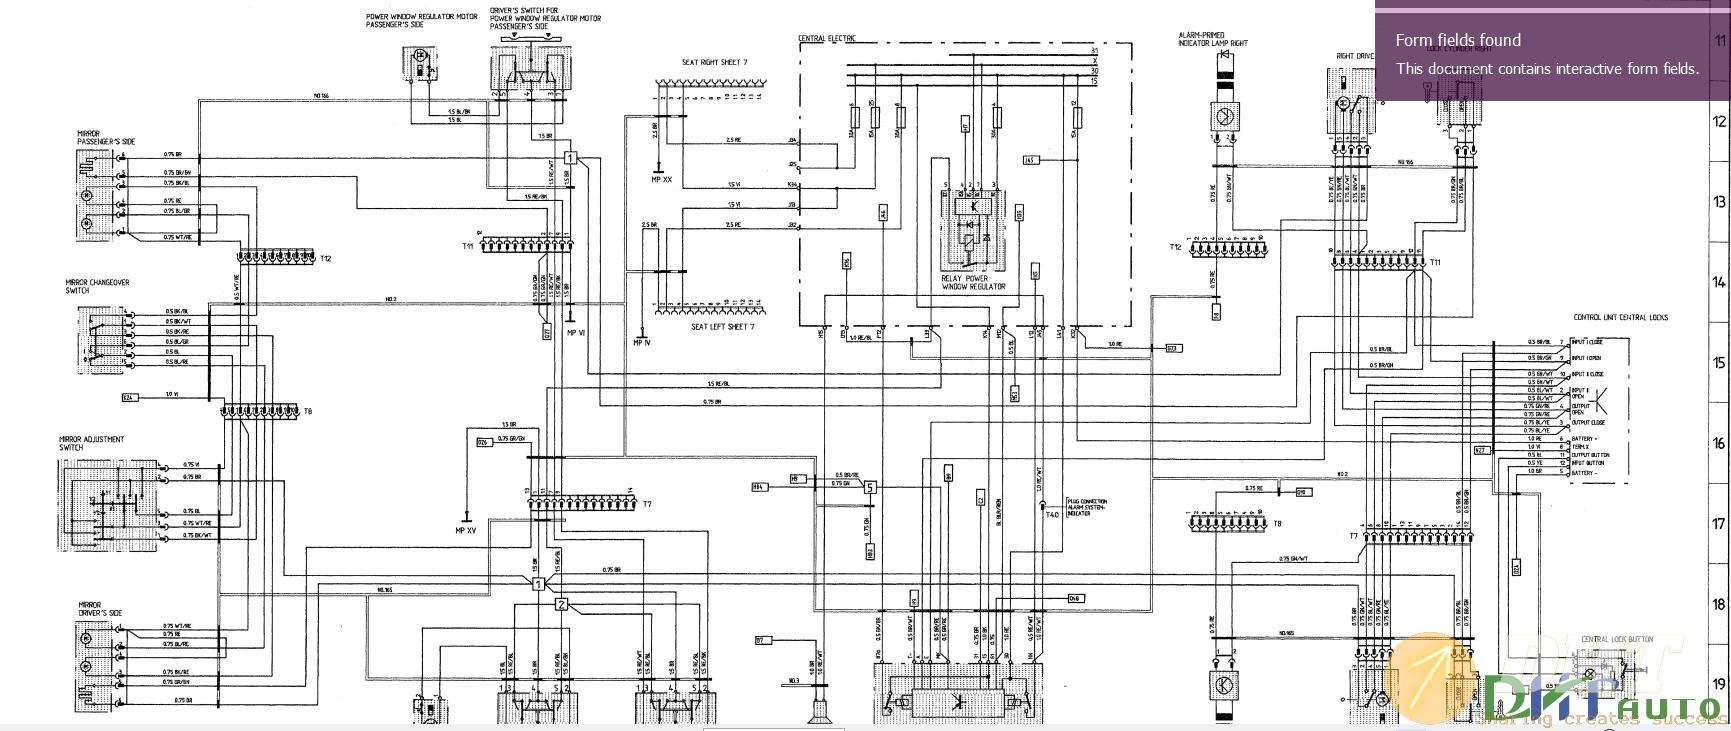 Porsche-911-Carrena-4-Workshop-Manual-Volume-7-3.png